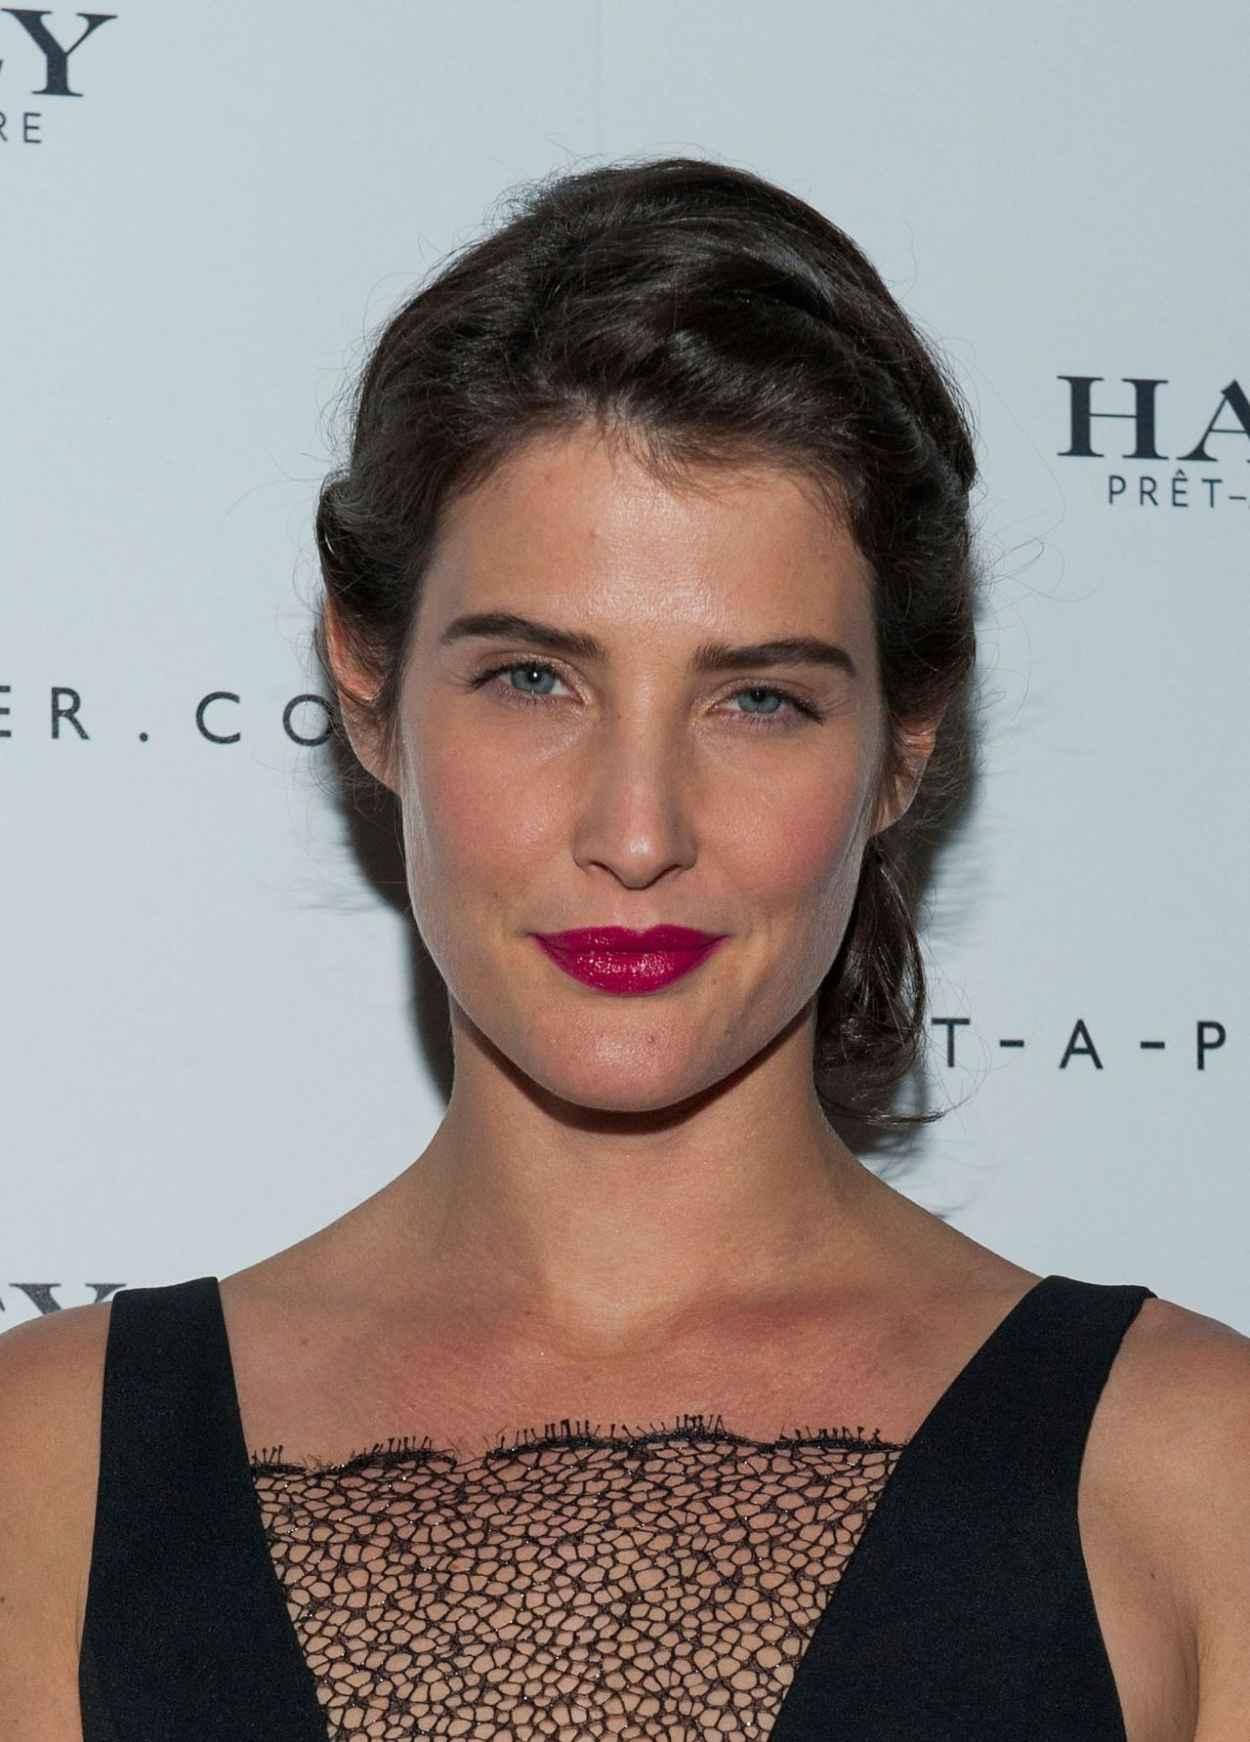 Cobie Smulders at Net-A-Porter Hosts Haney Pret-A-Couture Launch-1